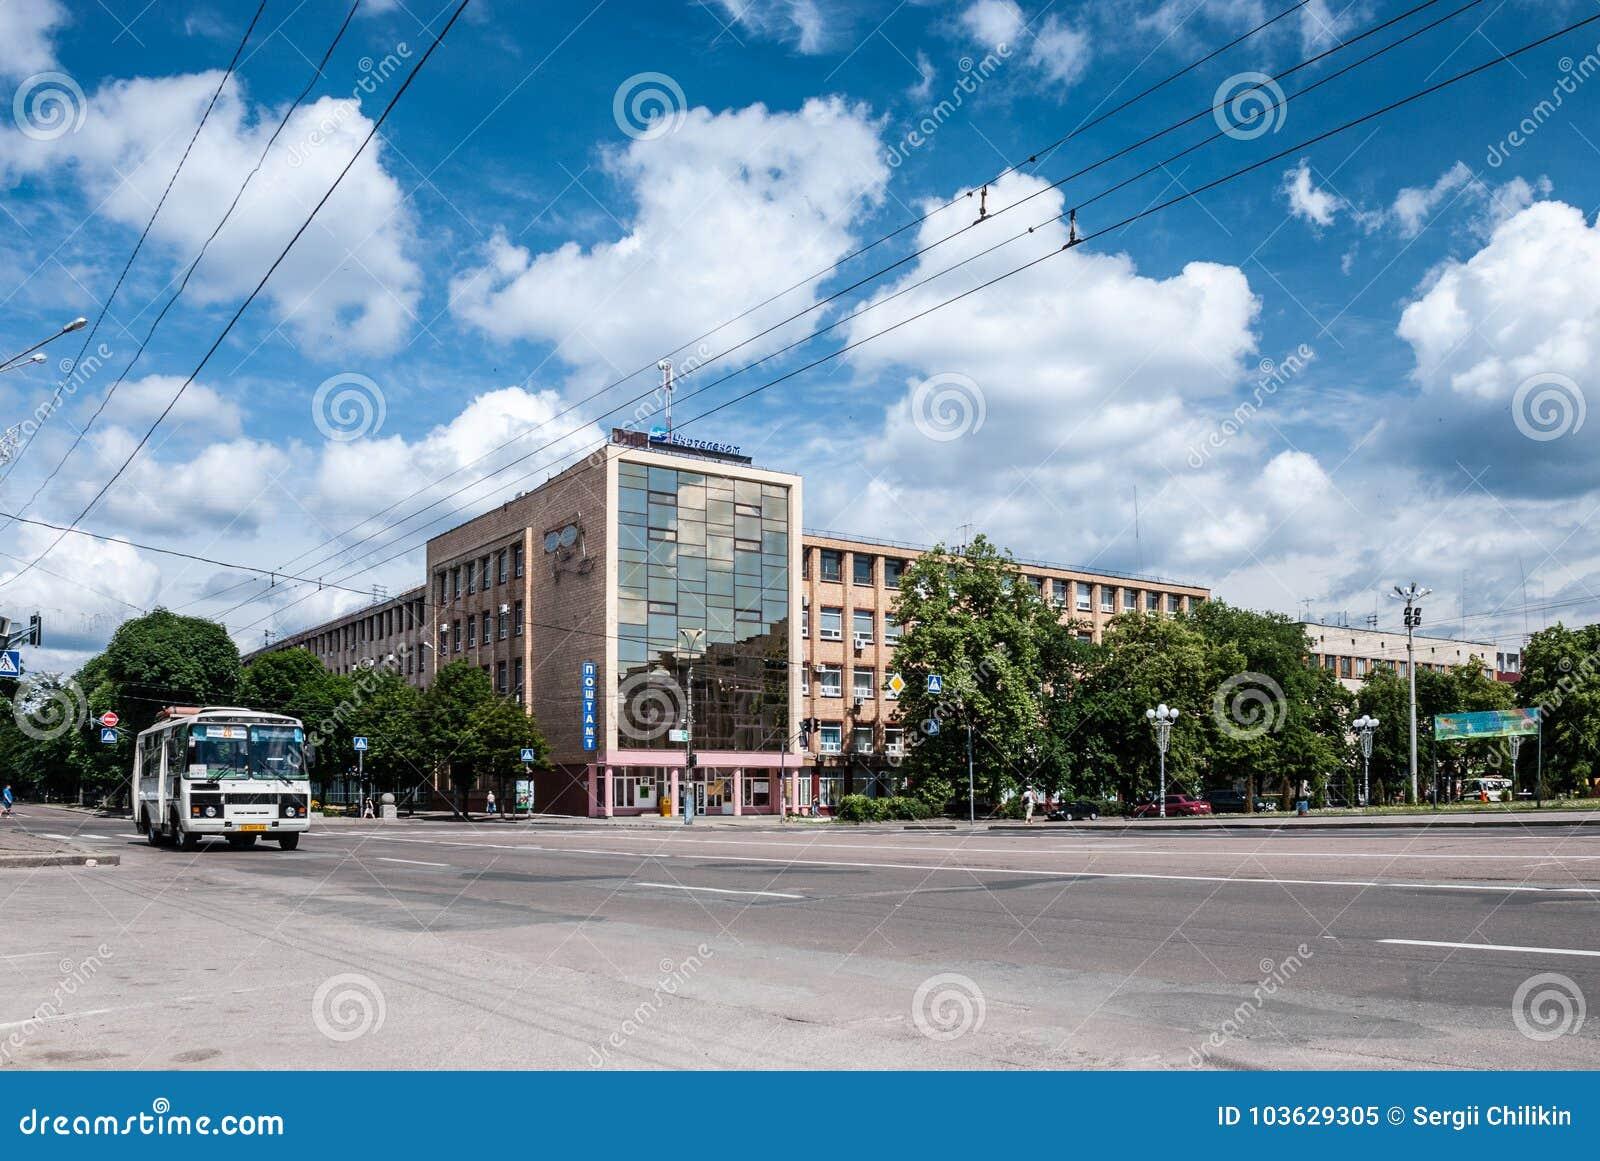 Cherkasy, Ukraine - 2. Juni 2013: Kathedralen-Quadrat